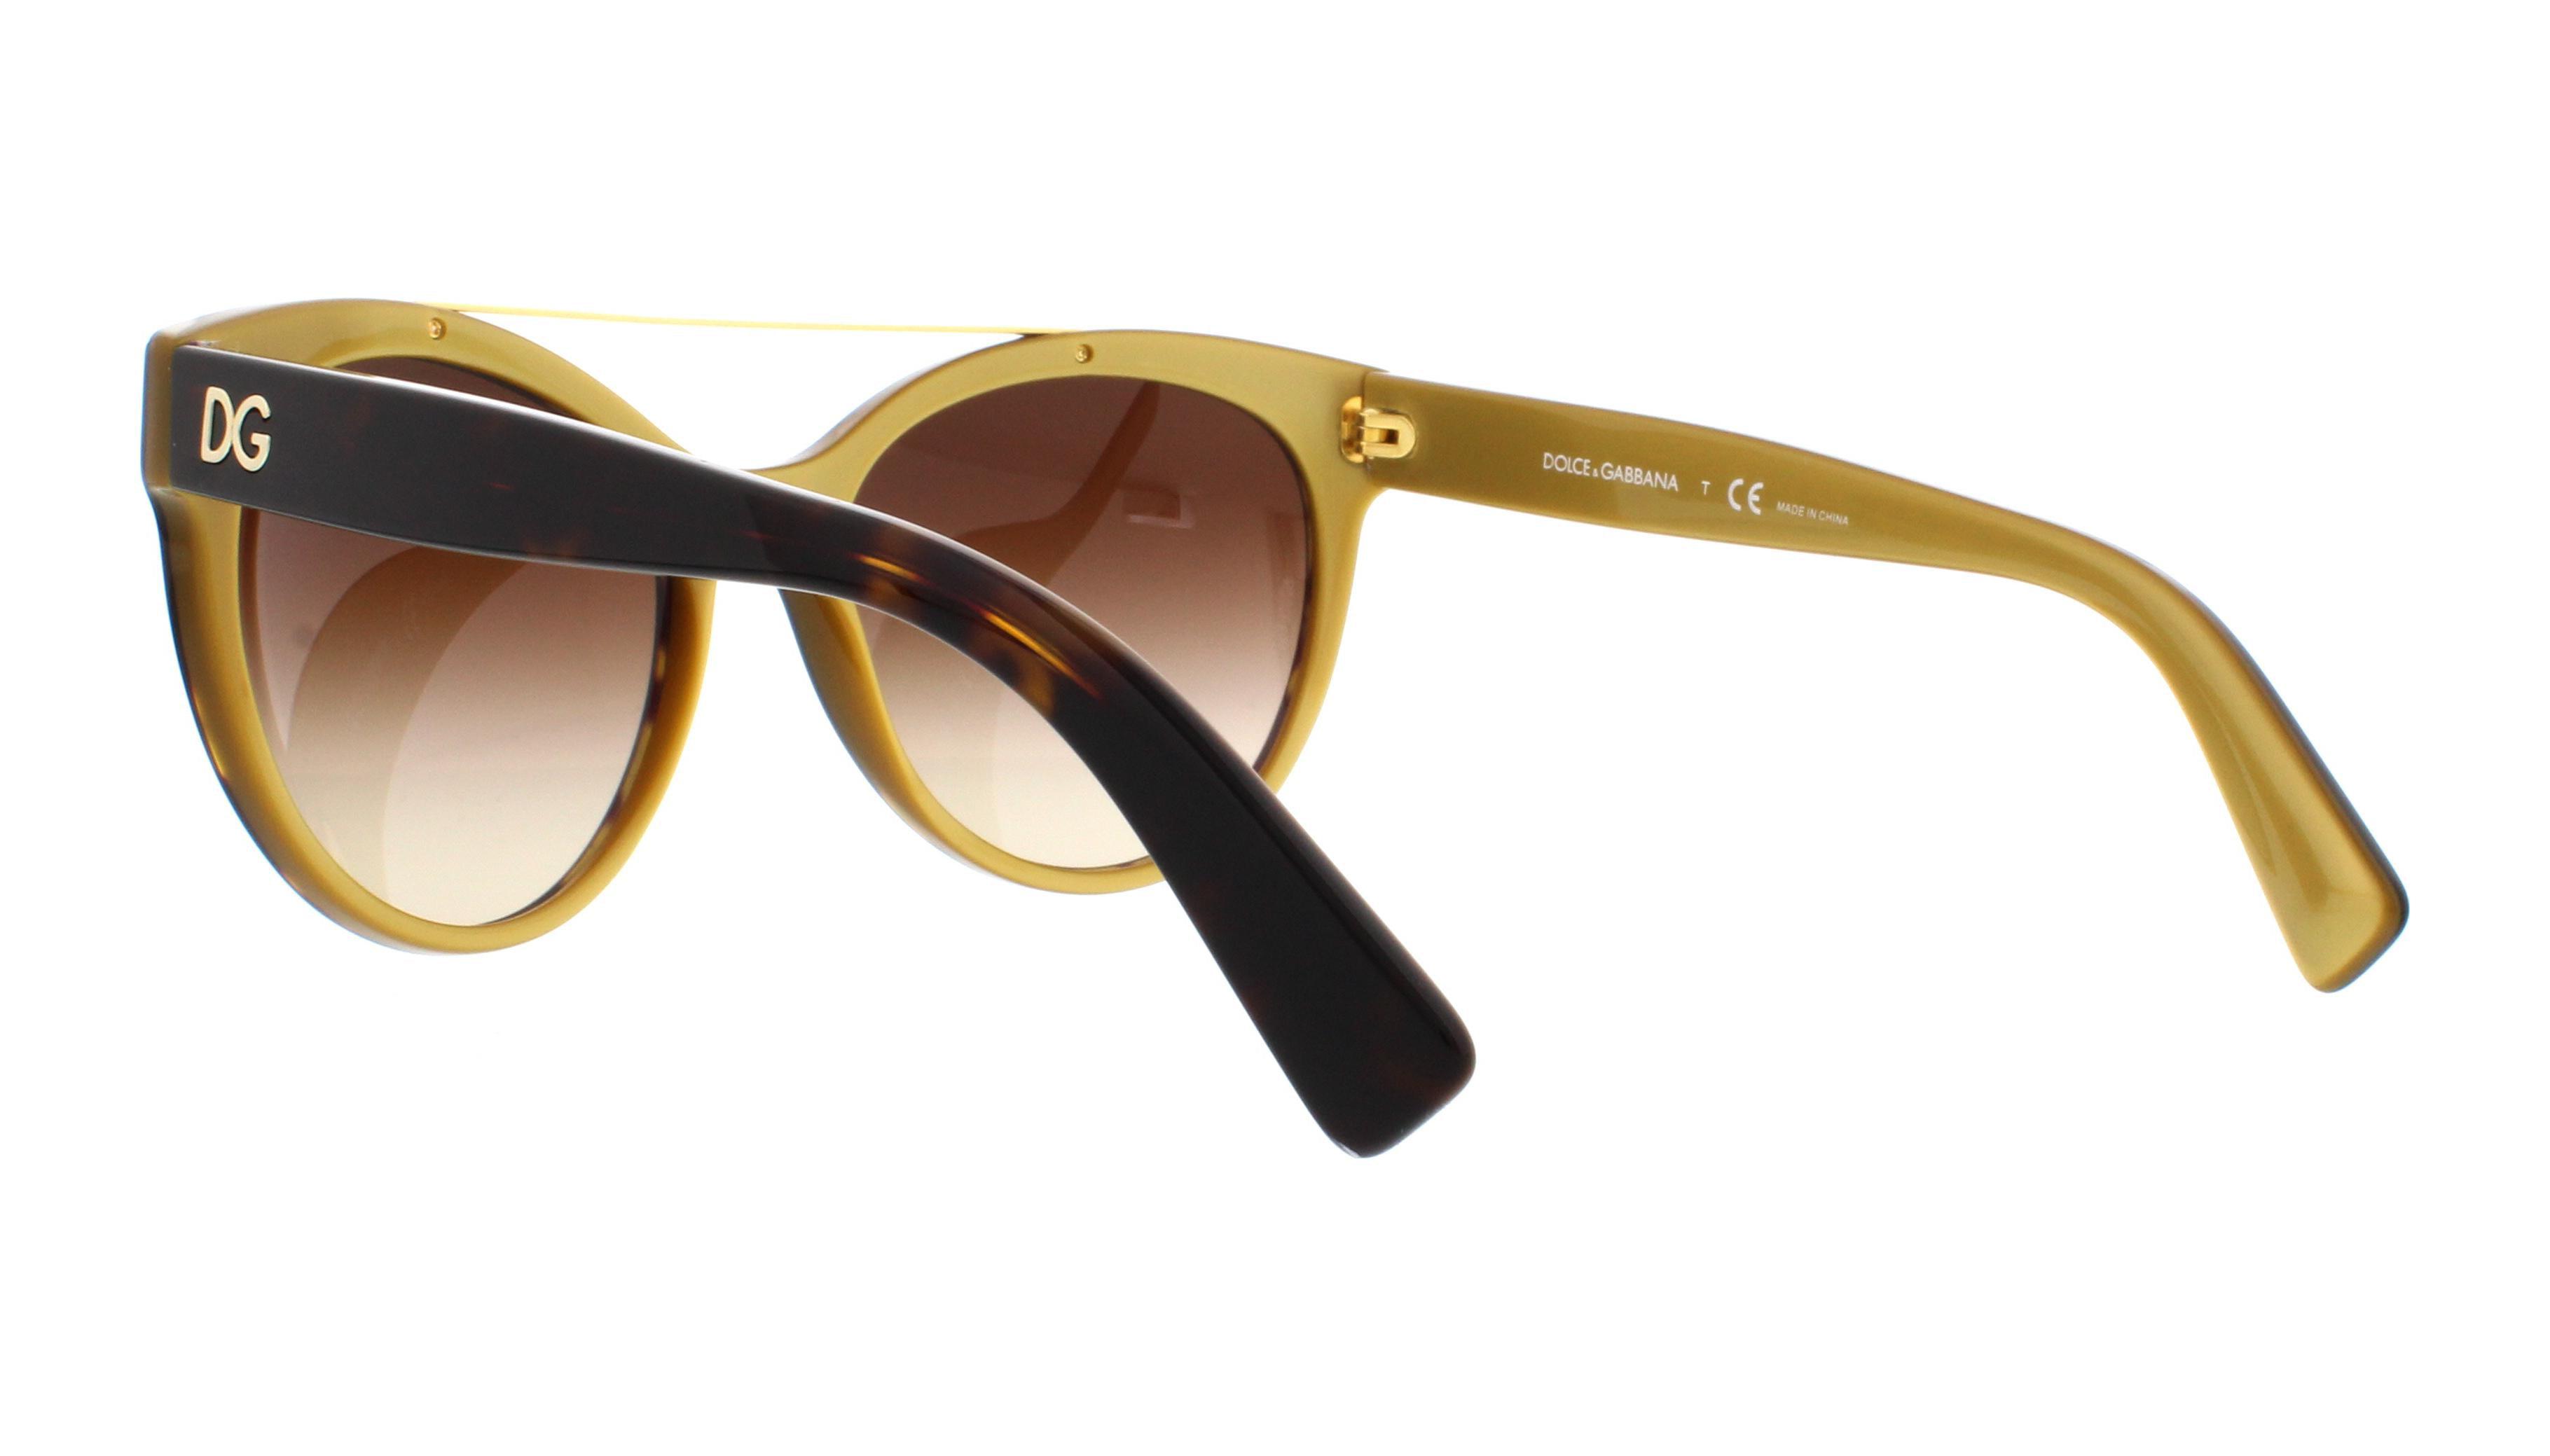 11ae75d5f54e Dolce   Gabbana - DOLCE   GABBANA Sunglasses DG4280 29558G Top Black On Gold  57MM - Walmart.com